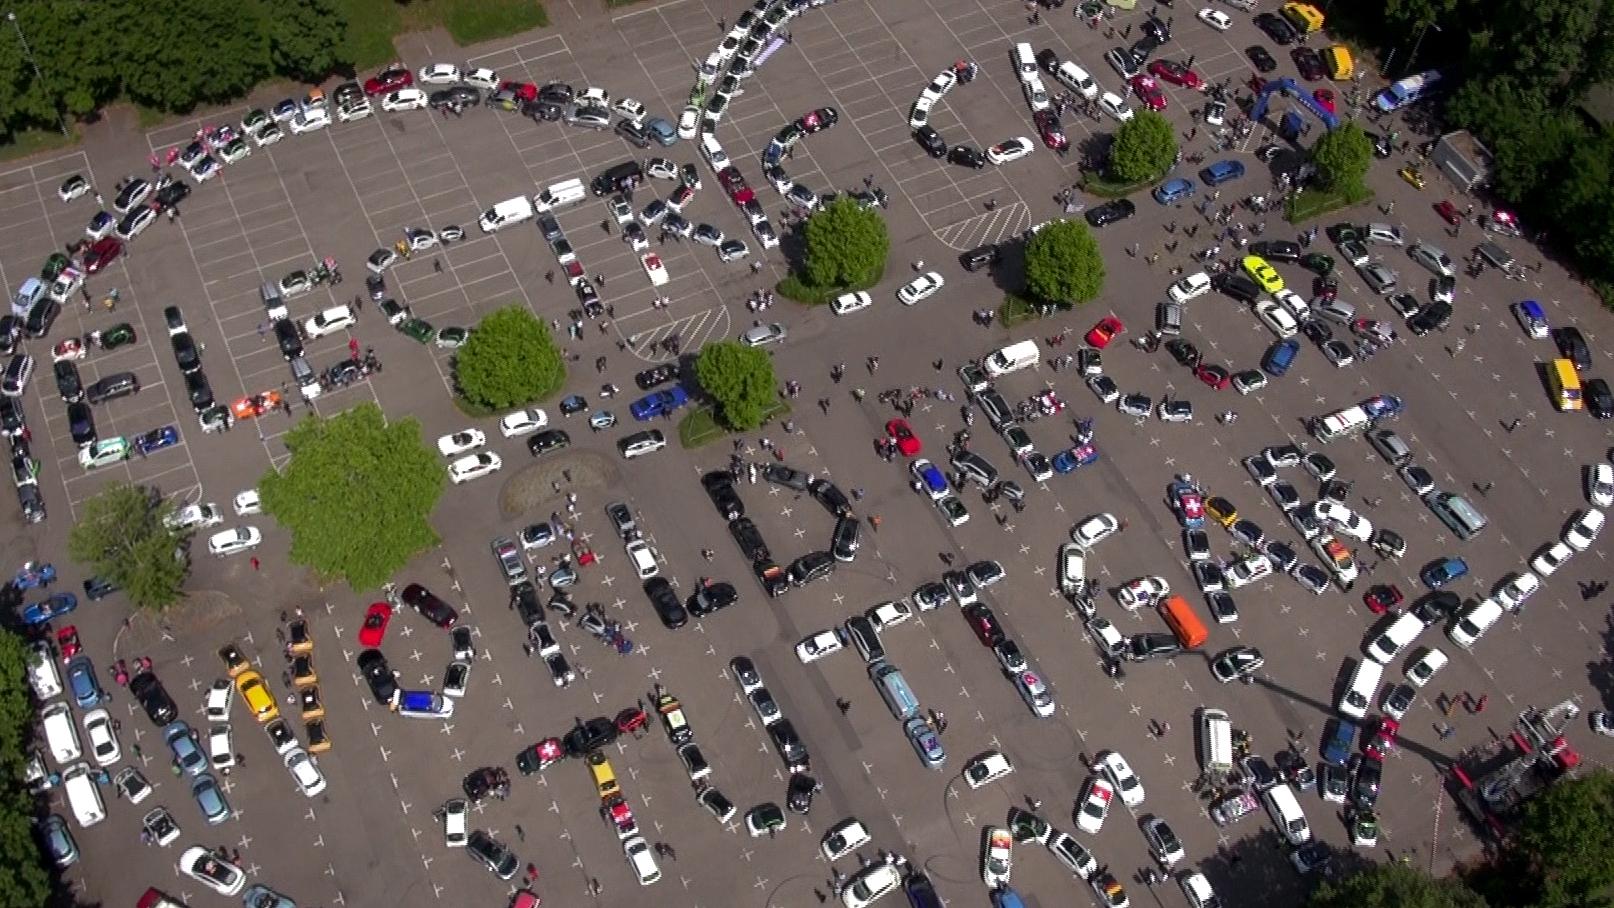 Größte Elektrofahrzeug-Parade der Welt – Rekordversuch am 23. Mai in Berlin beim Formel E Rennen